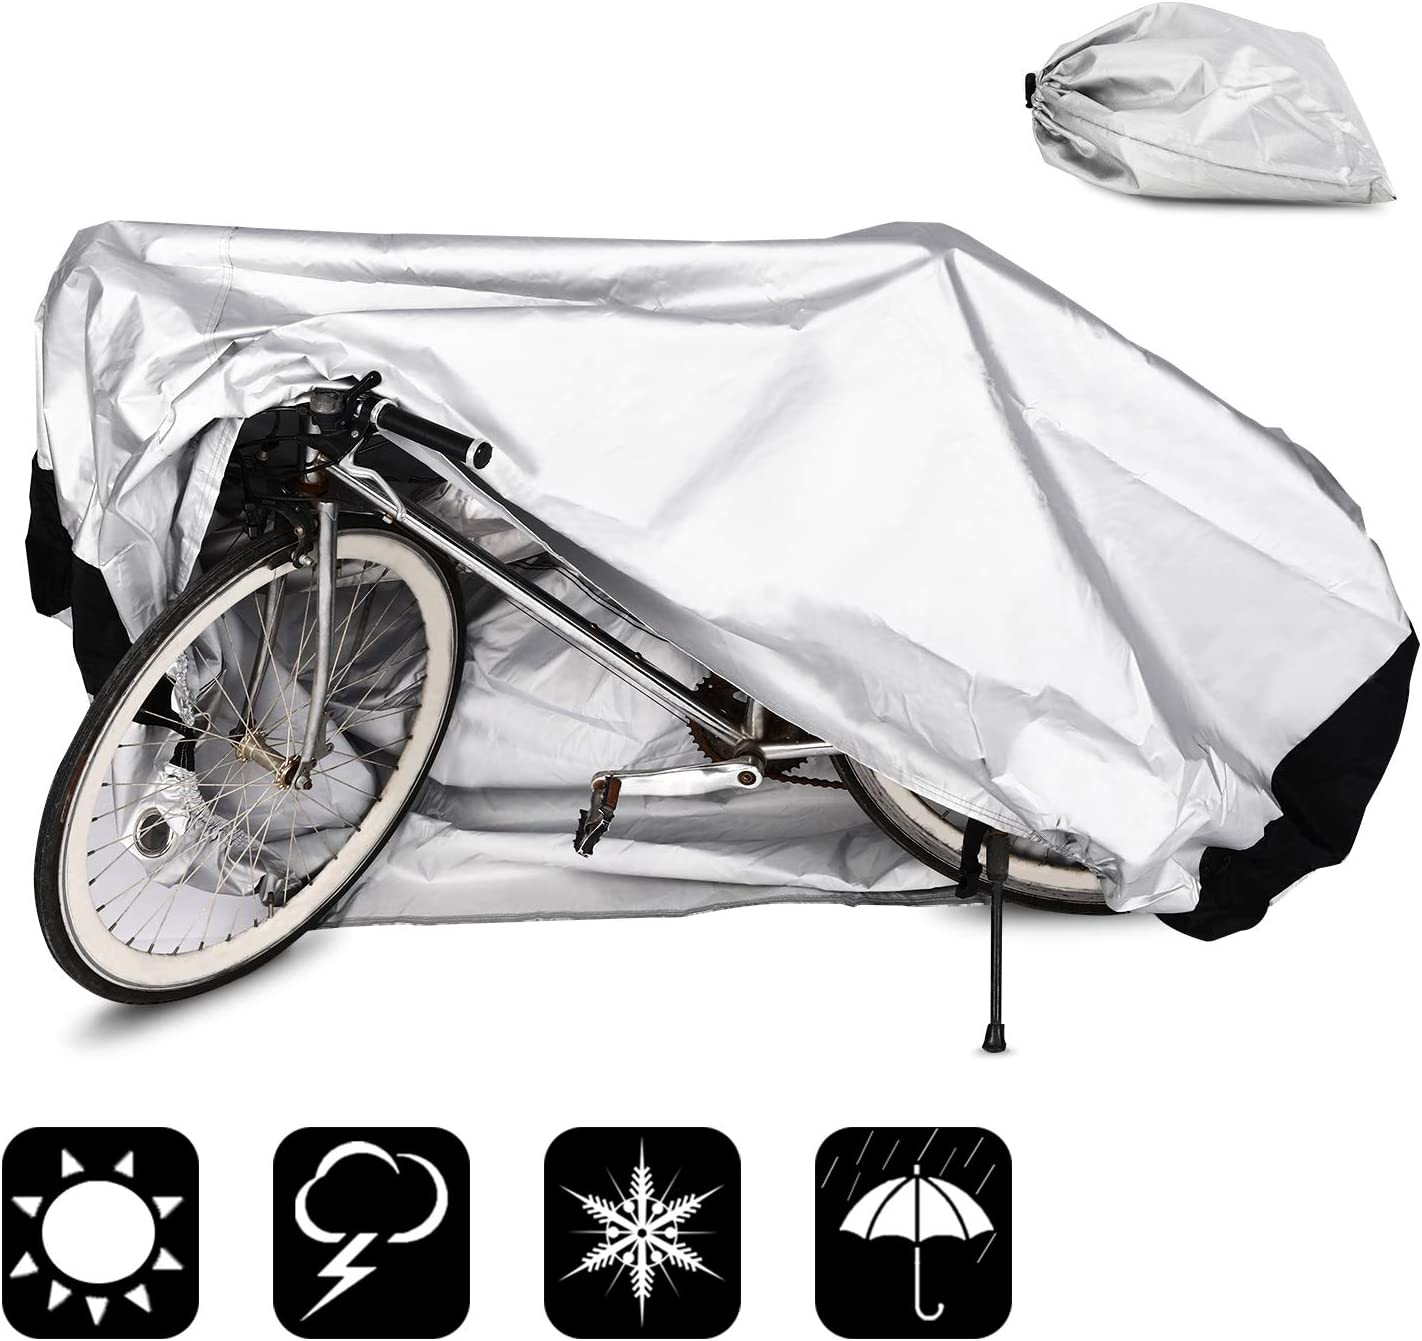 Fahrradabdeckung Wasserdicht Abdeckplane Fahrradschutzhülle Anti Dust Sun Regen